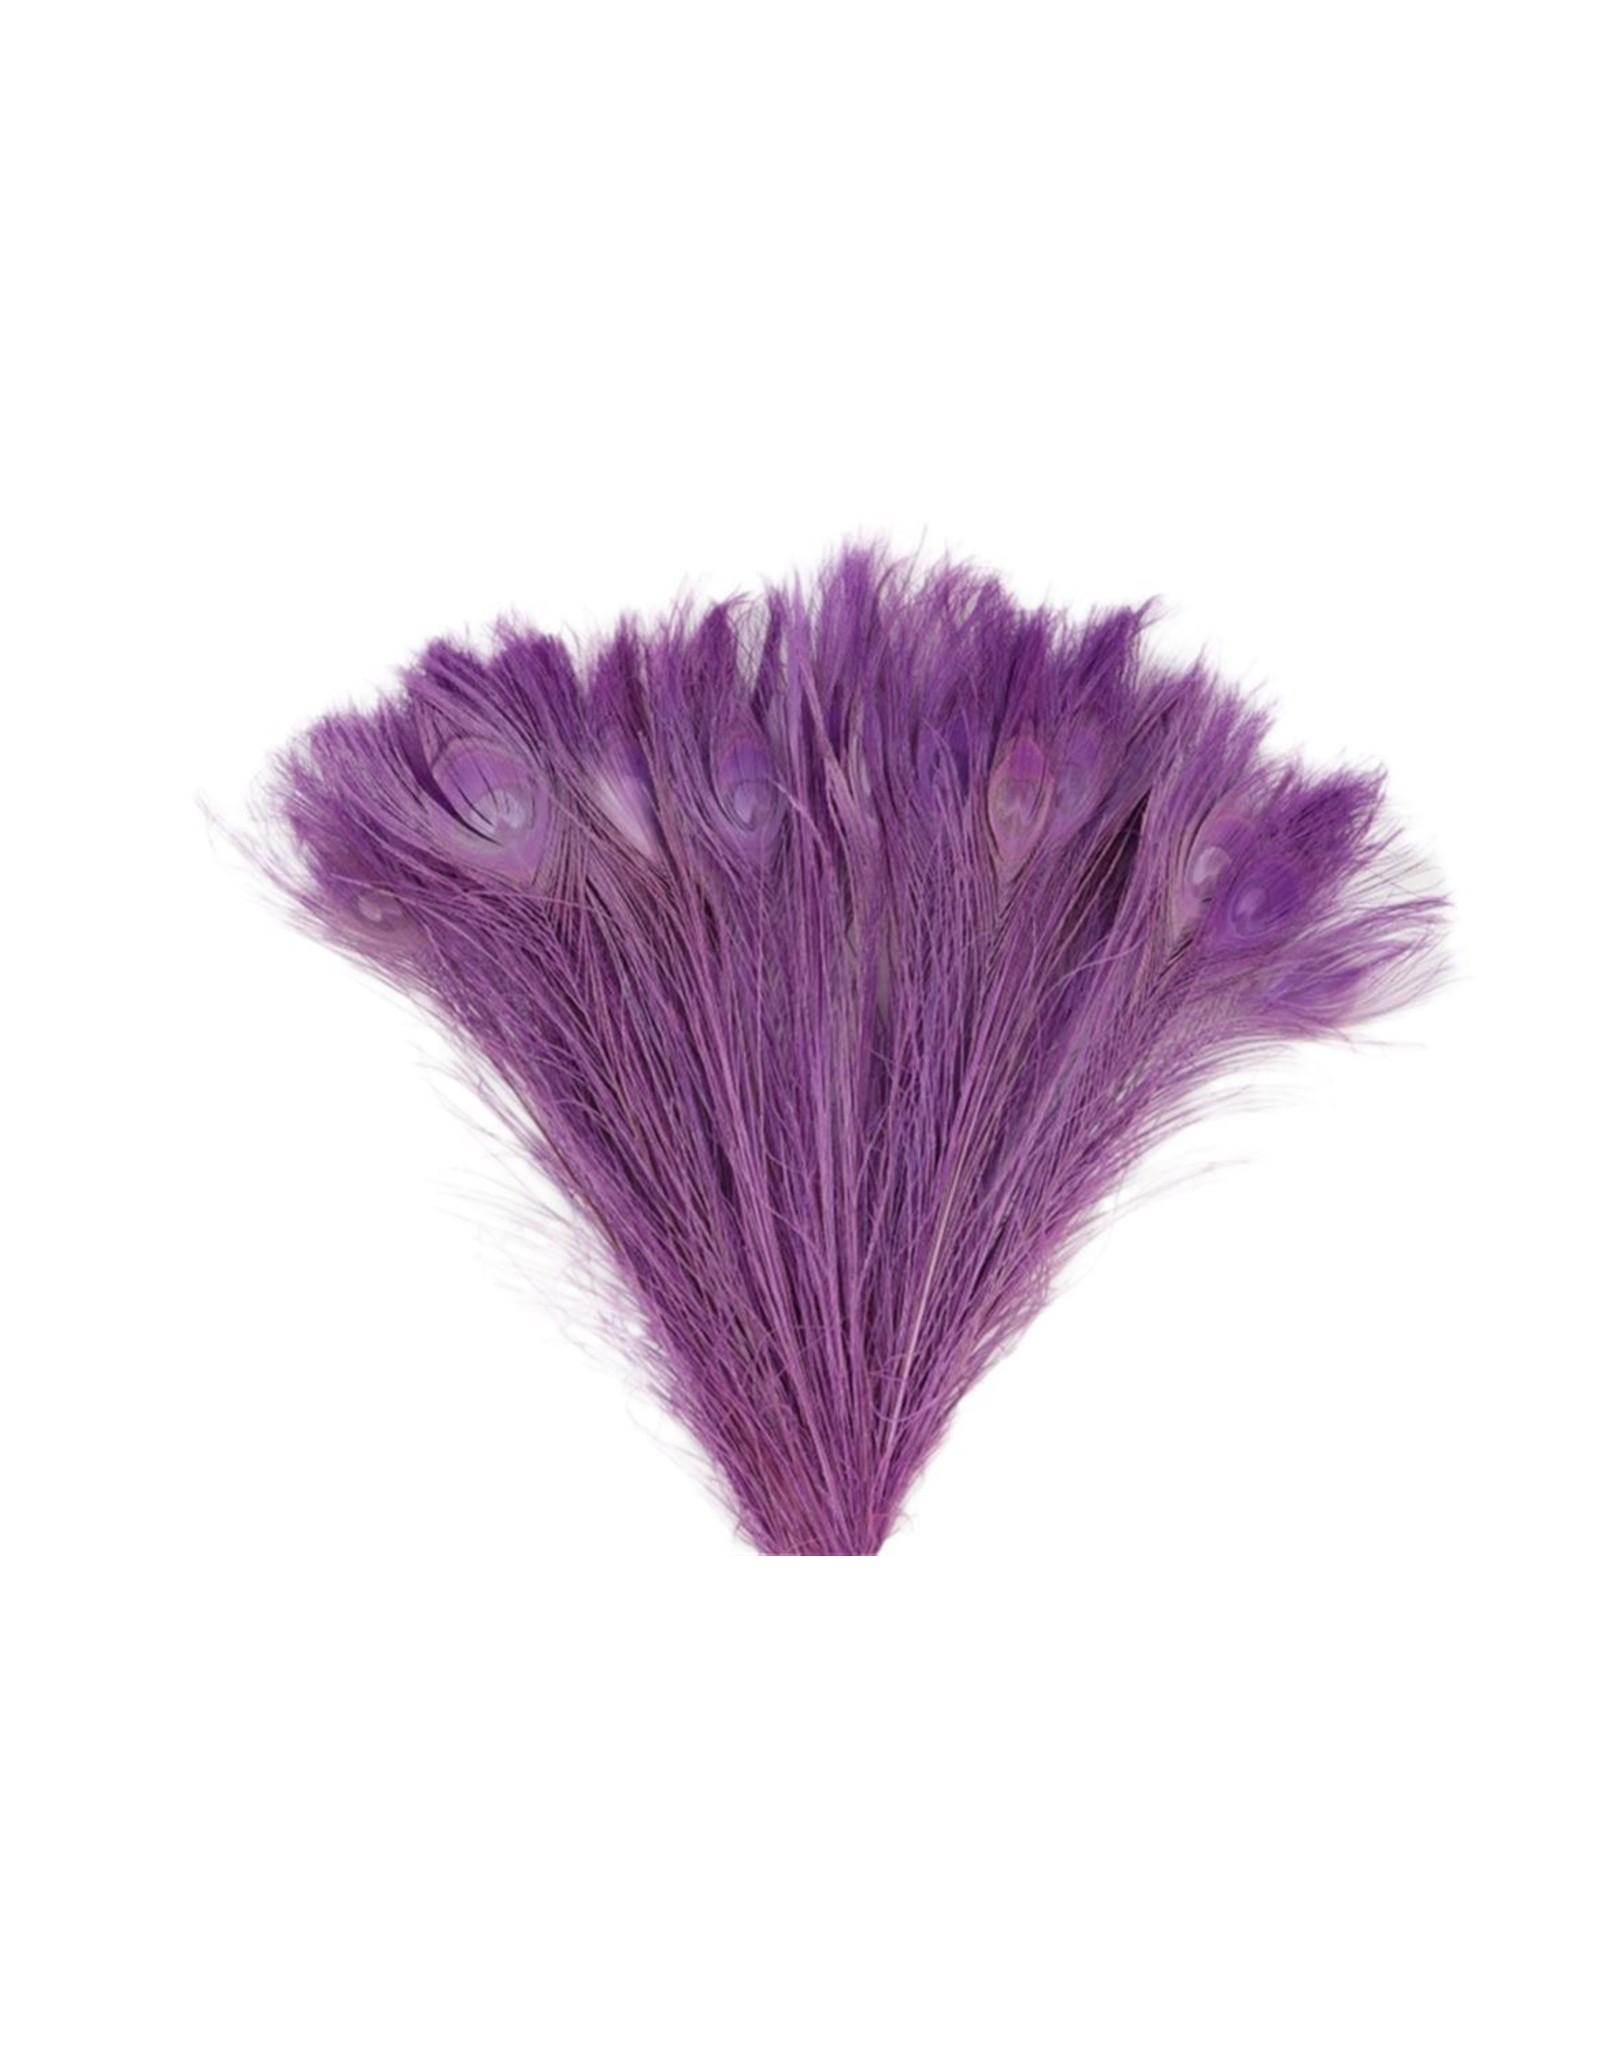 GF Dried Feather Peacock 45/50cm Milka x 50